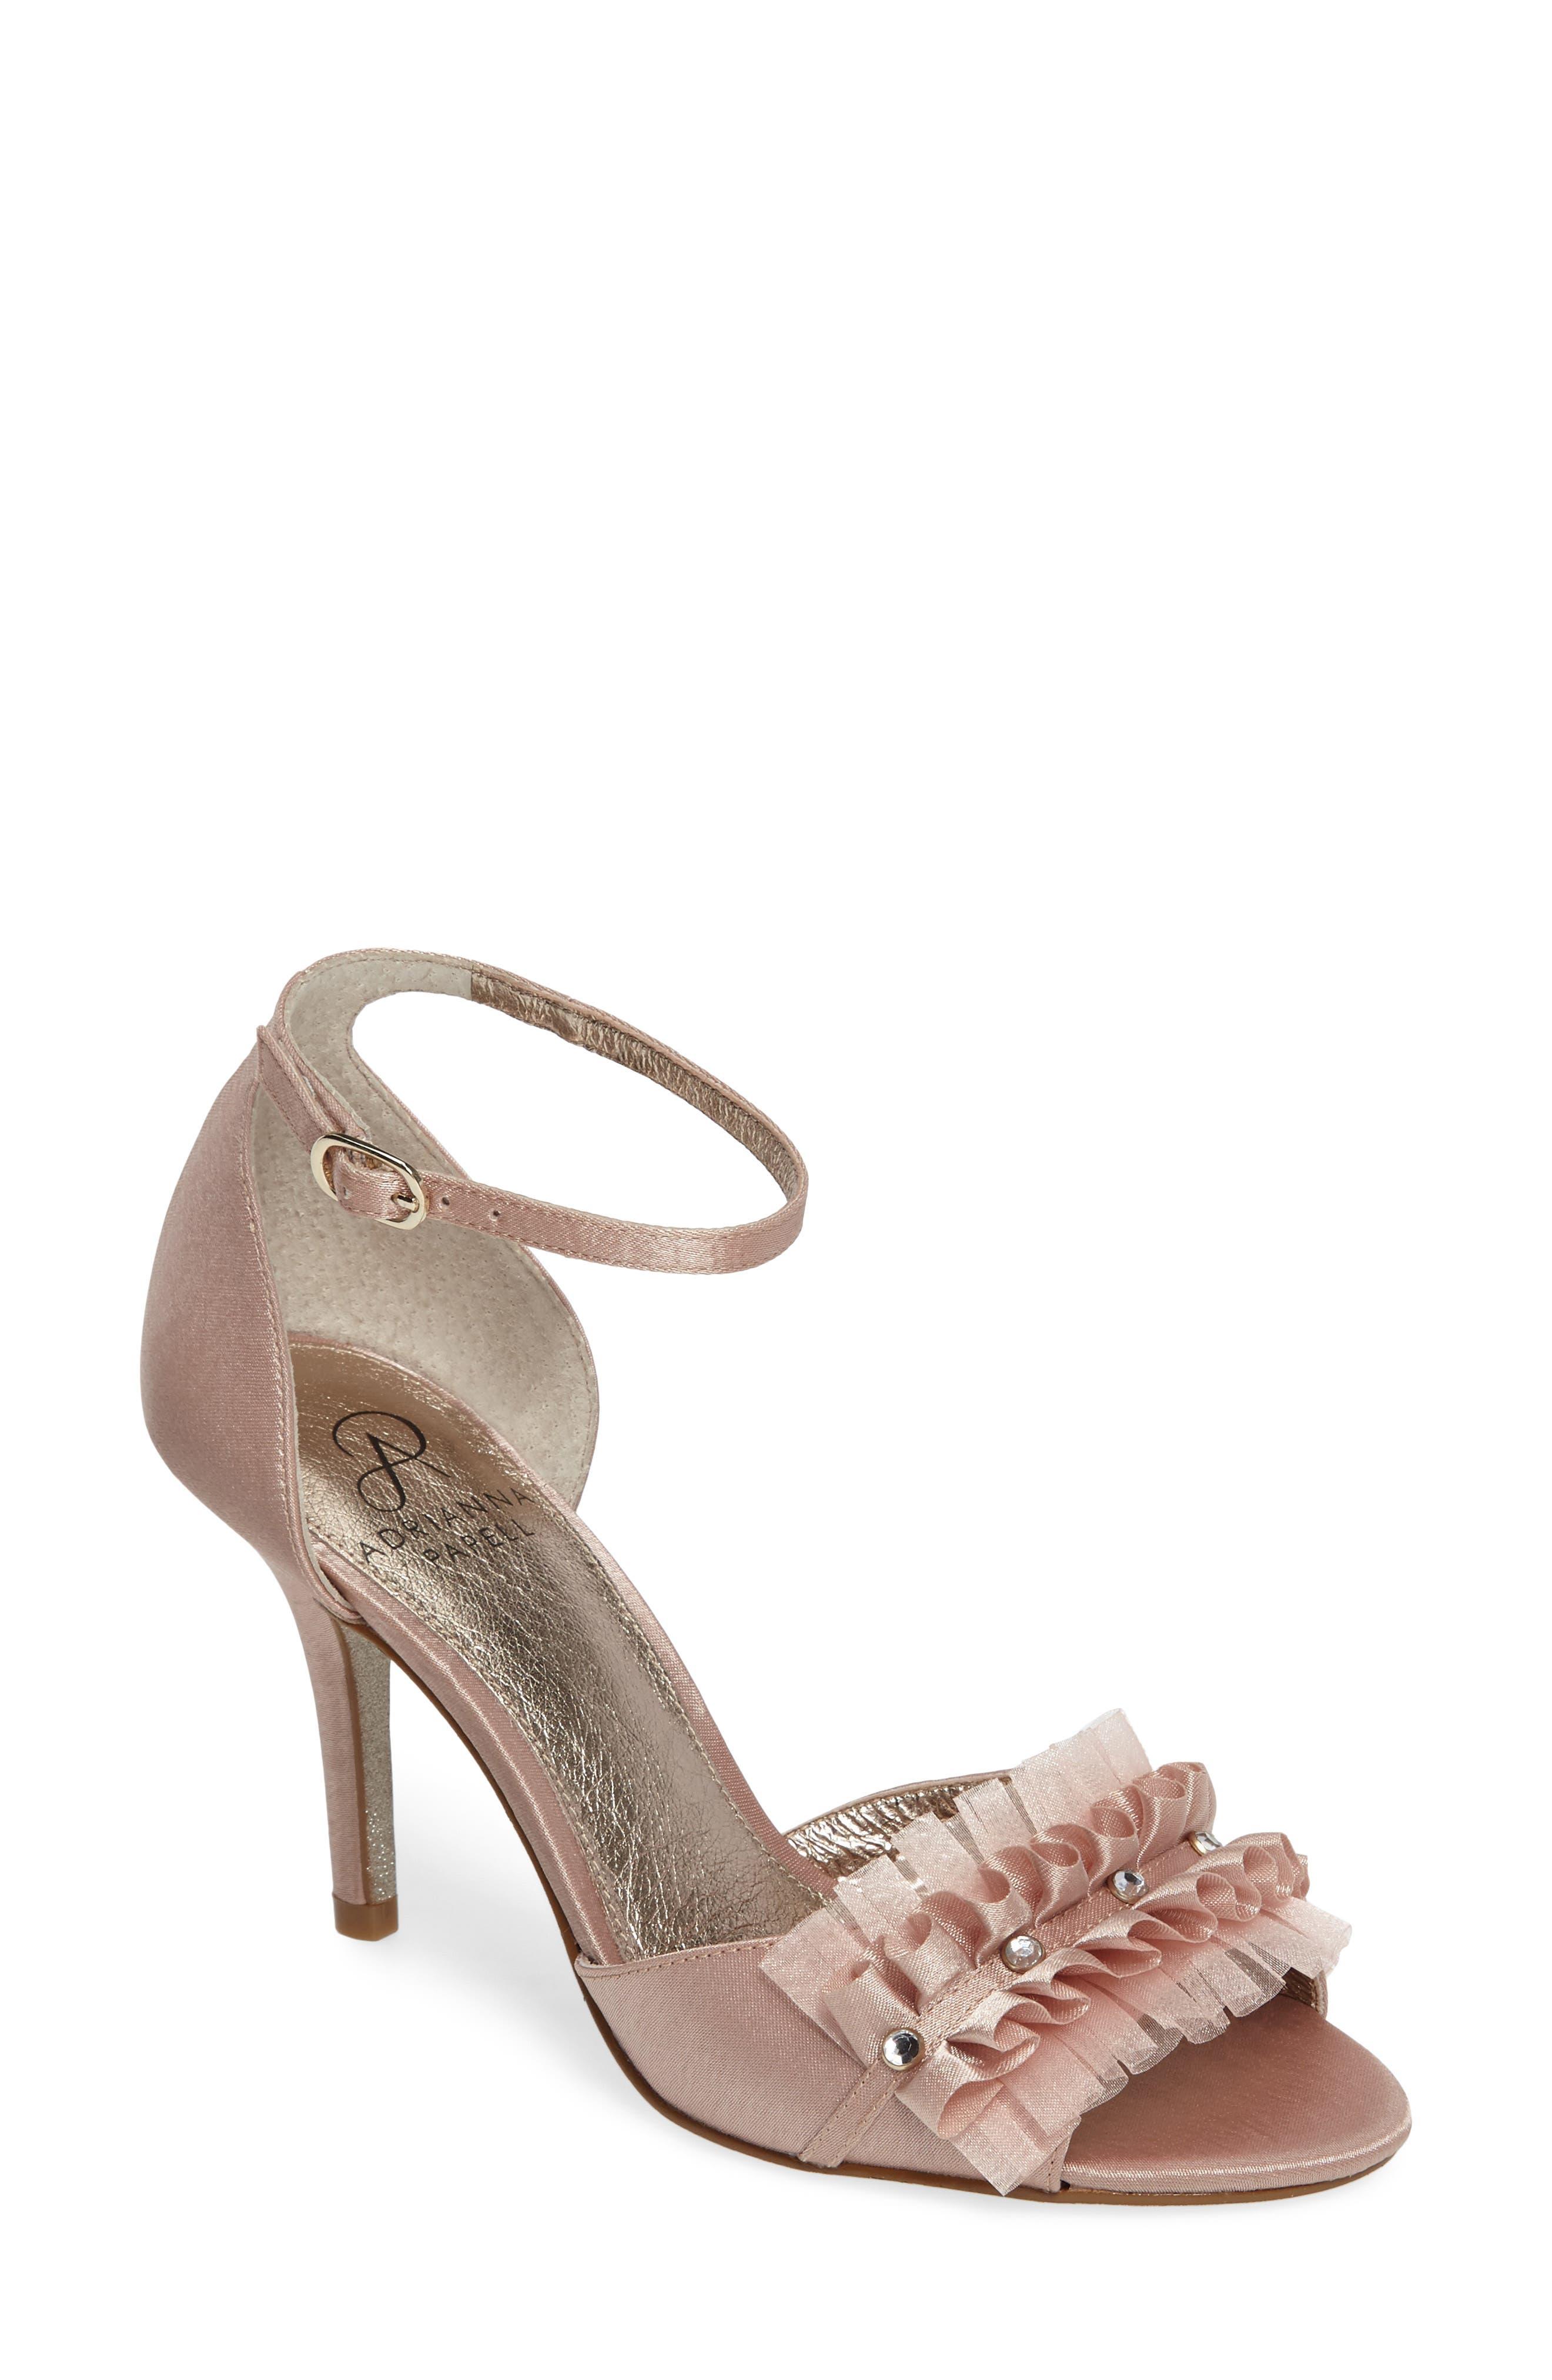 Alcott Chiffon Ruffle Sandal,                         Main,                         color, Blush Classic Satin